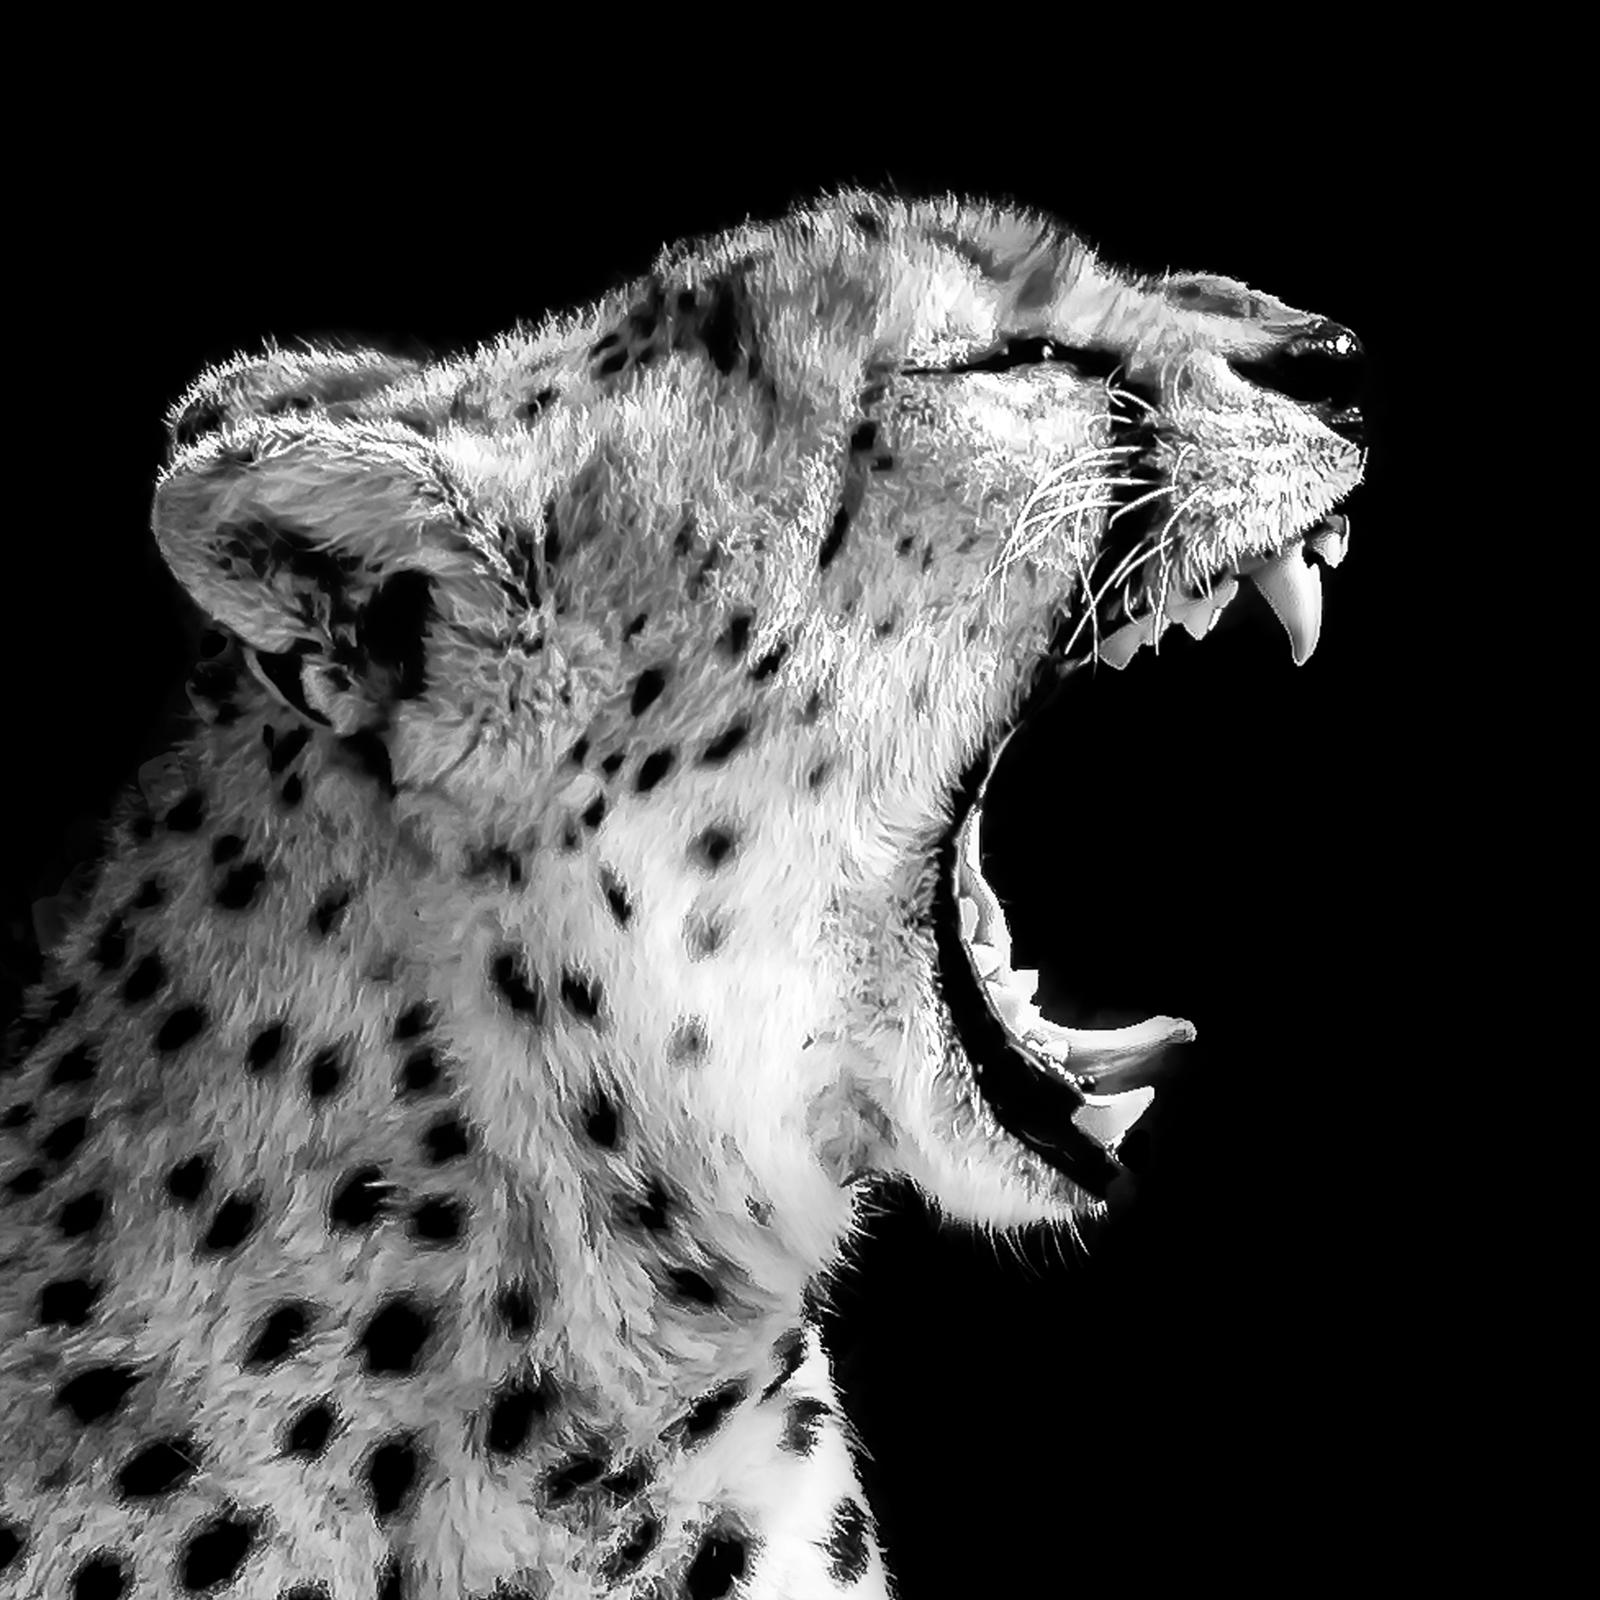 Julie_Eliason_Expressions_and_Impressions_Cheetah_Warning_06.jpg